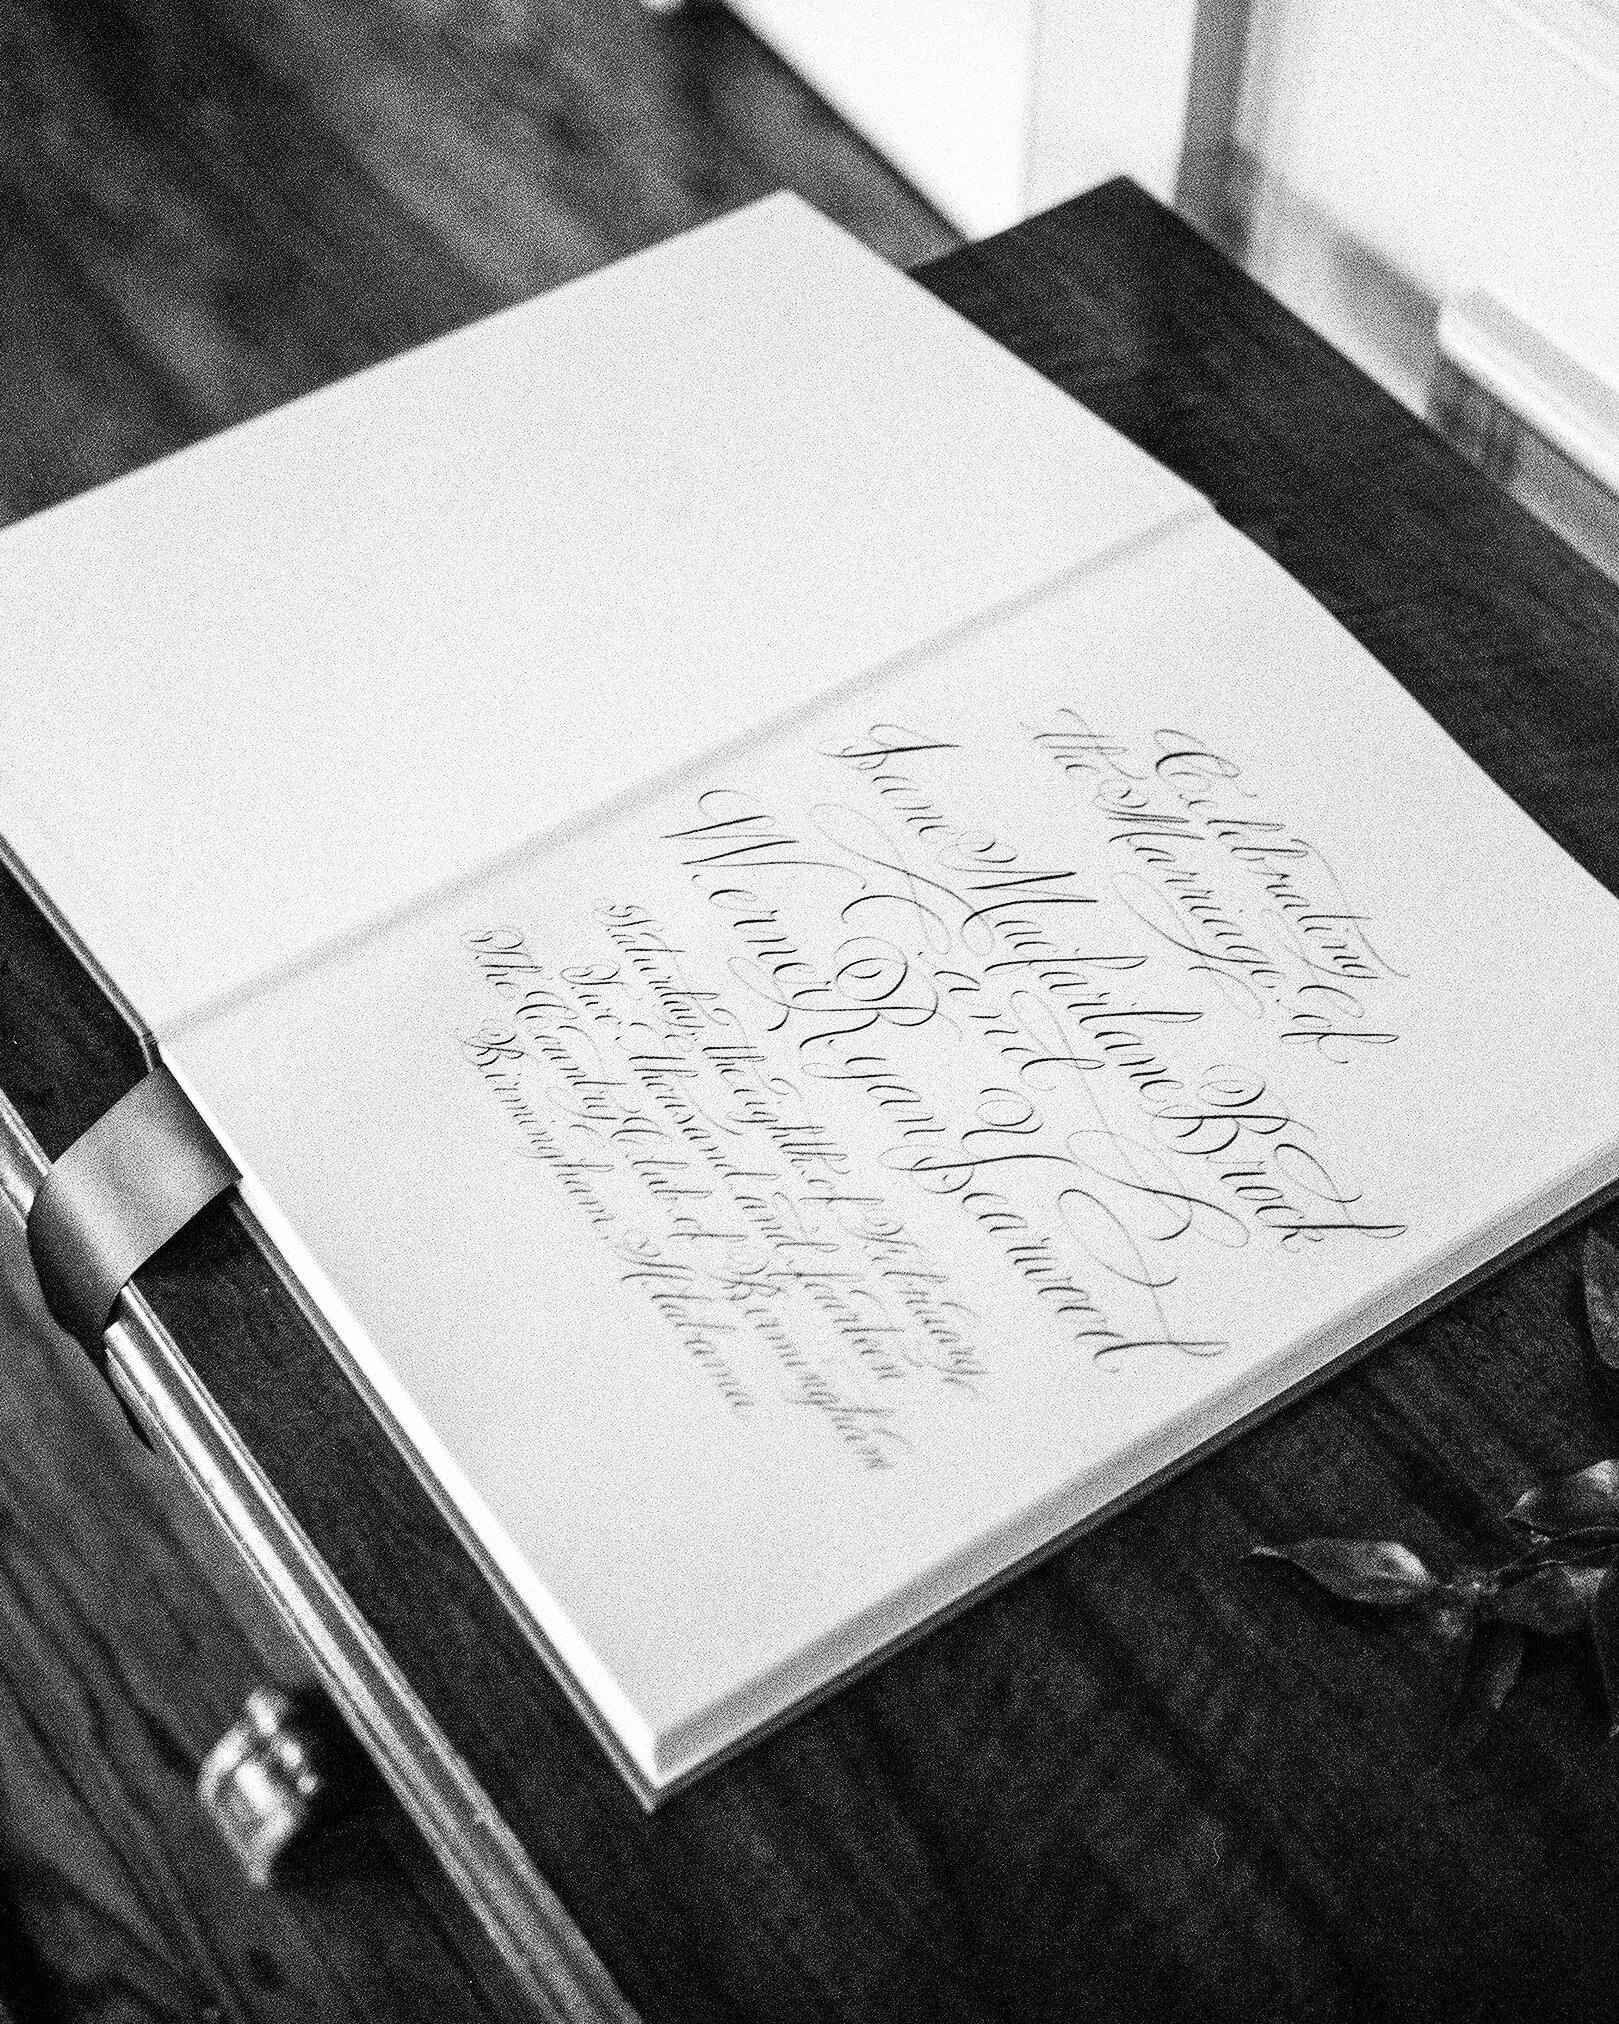 jane-ryan-wedding-guestbook-150-s111352-0714.jpg